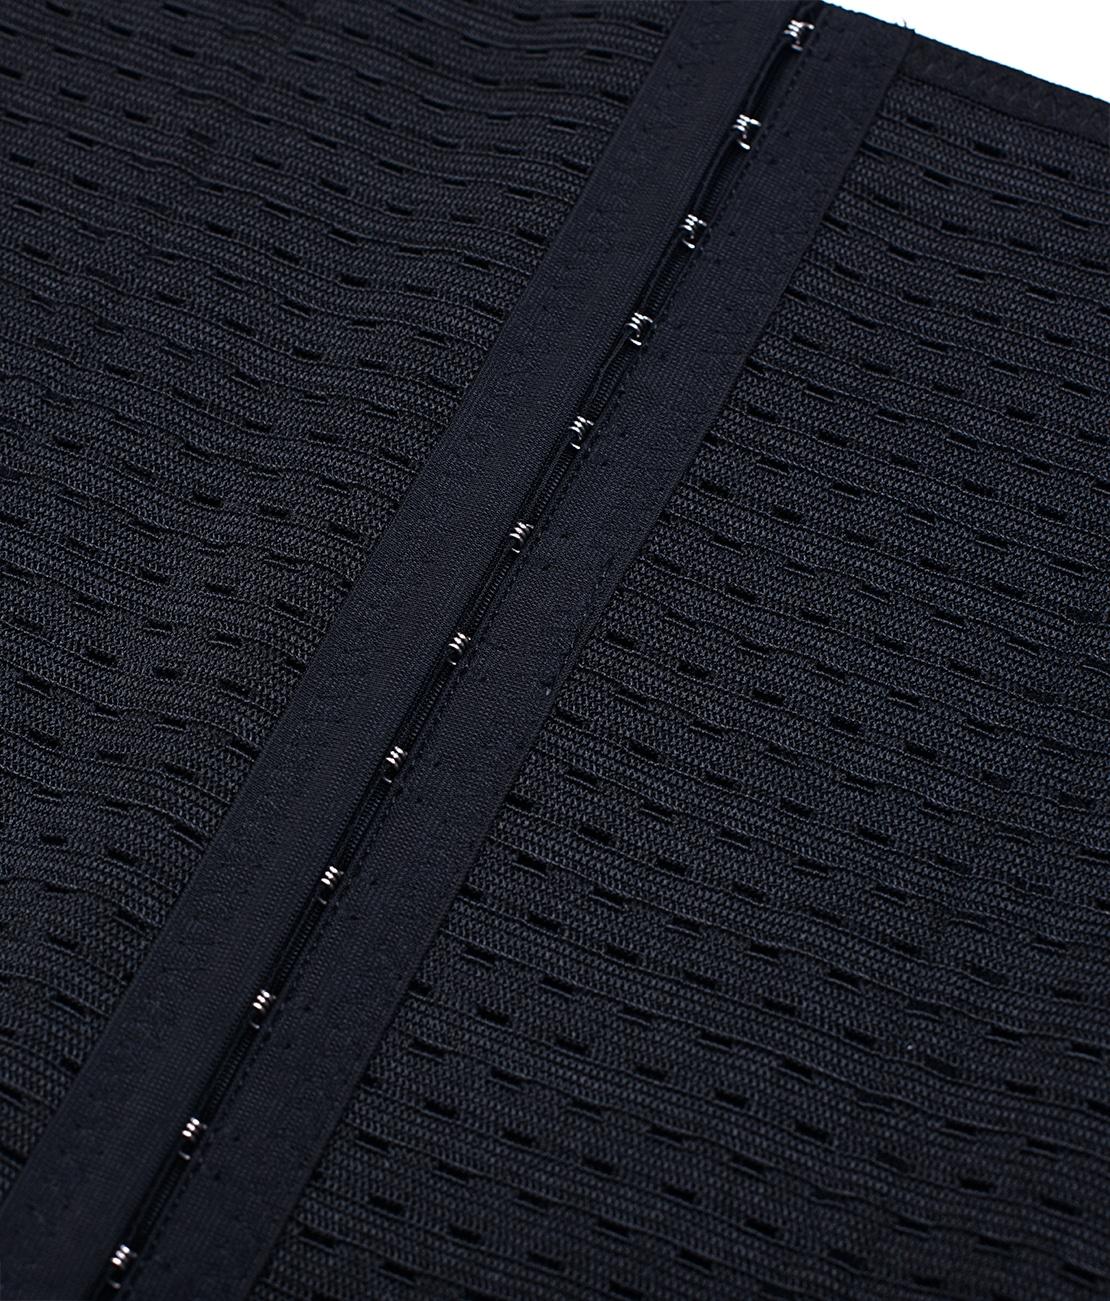 Gaine Taille Fine Noire Packshot Detail 1